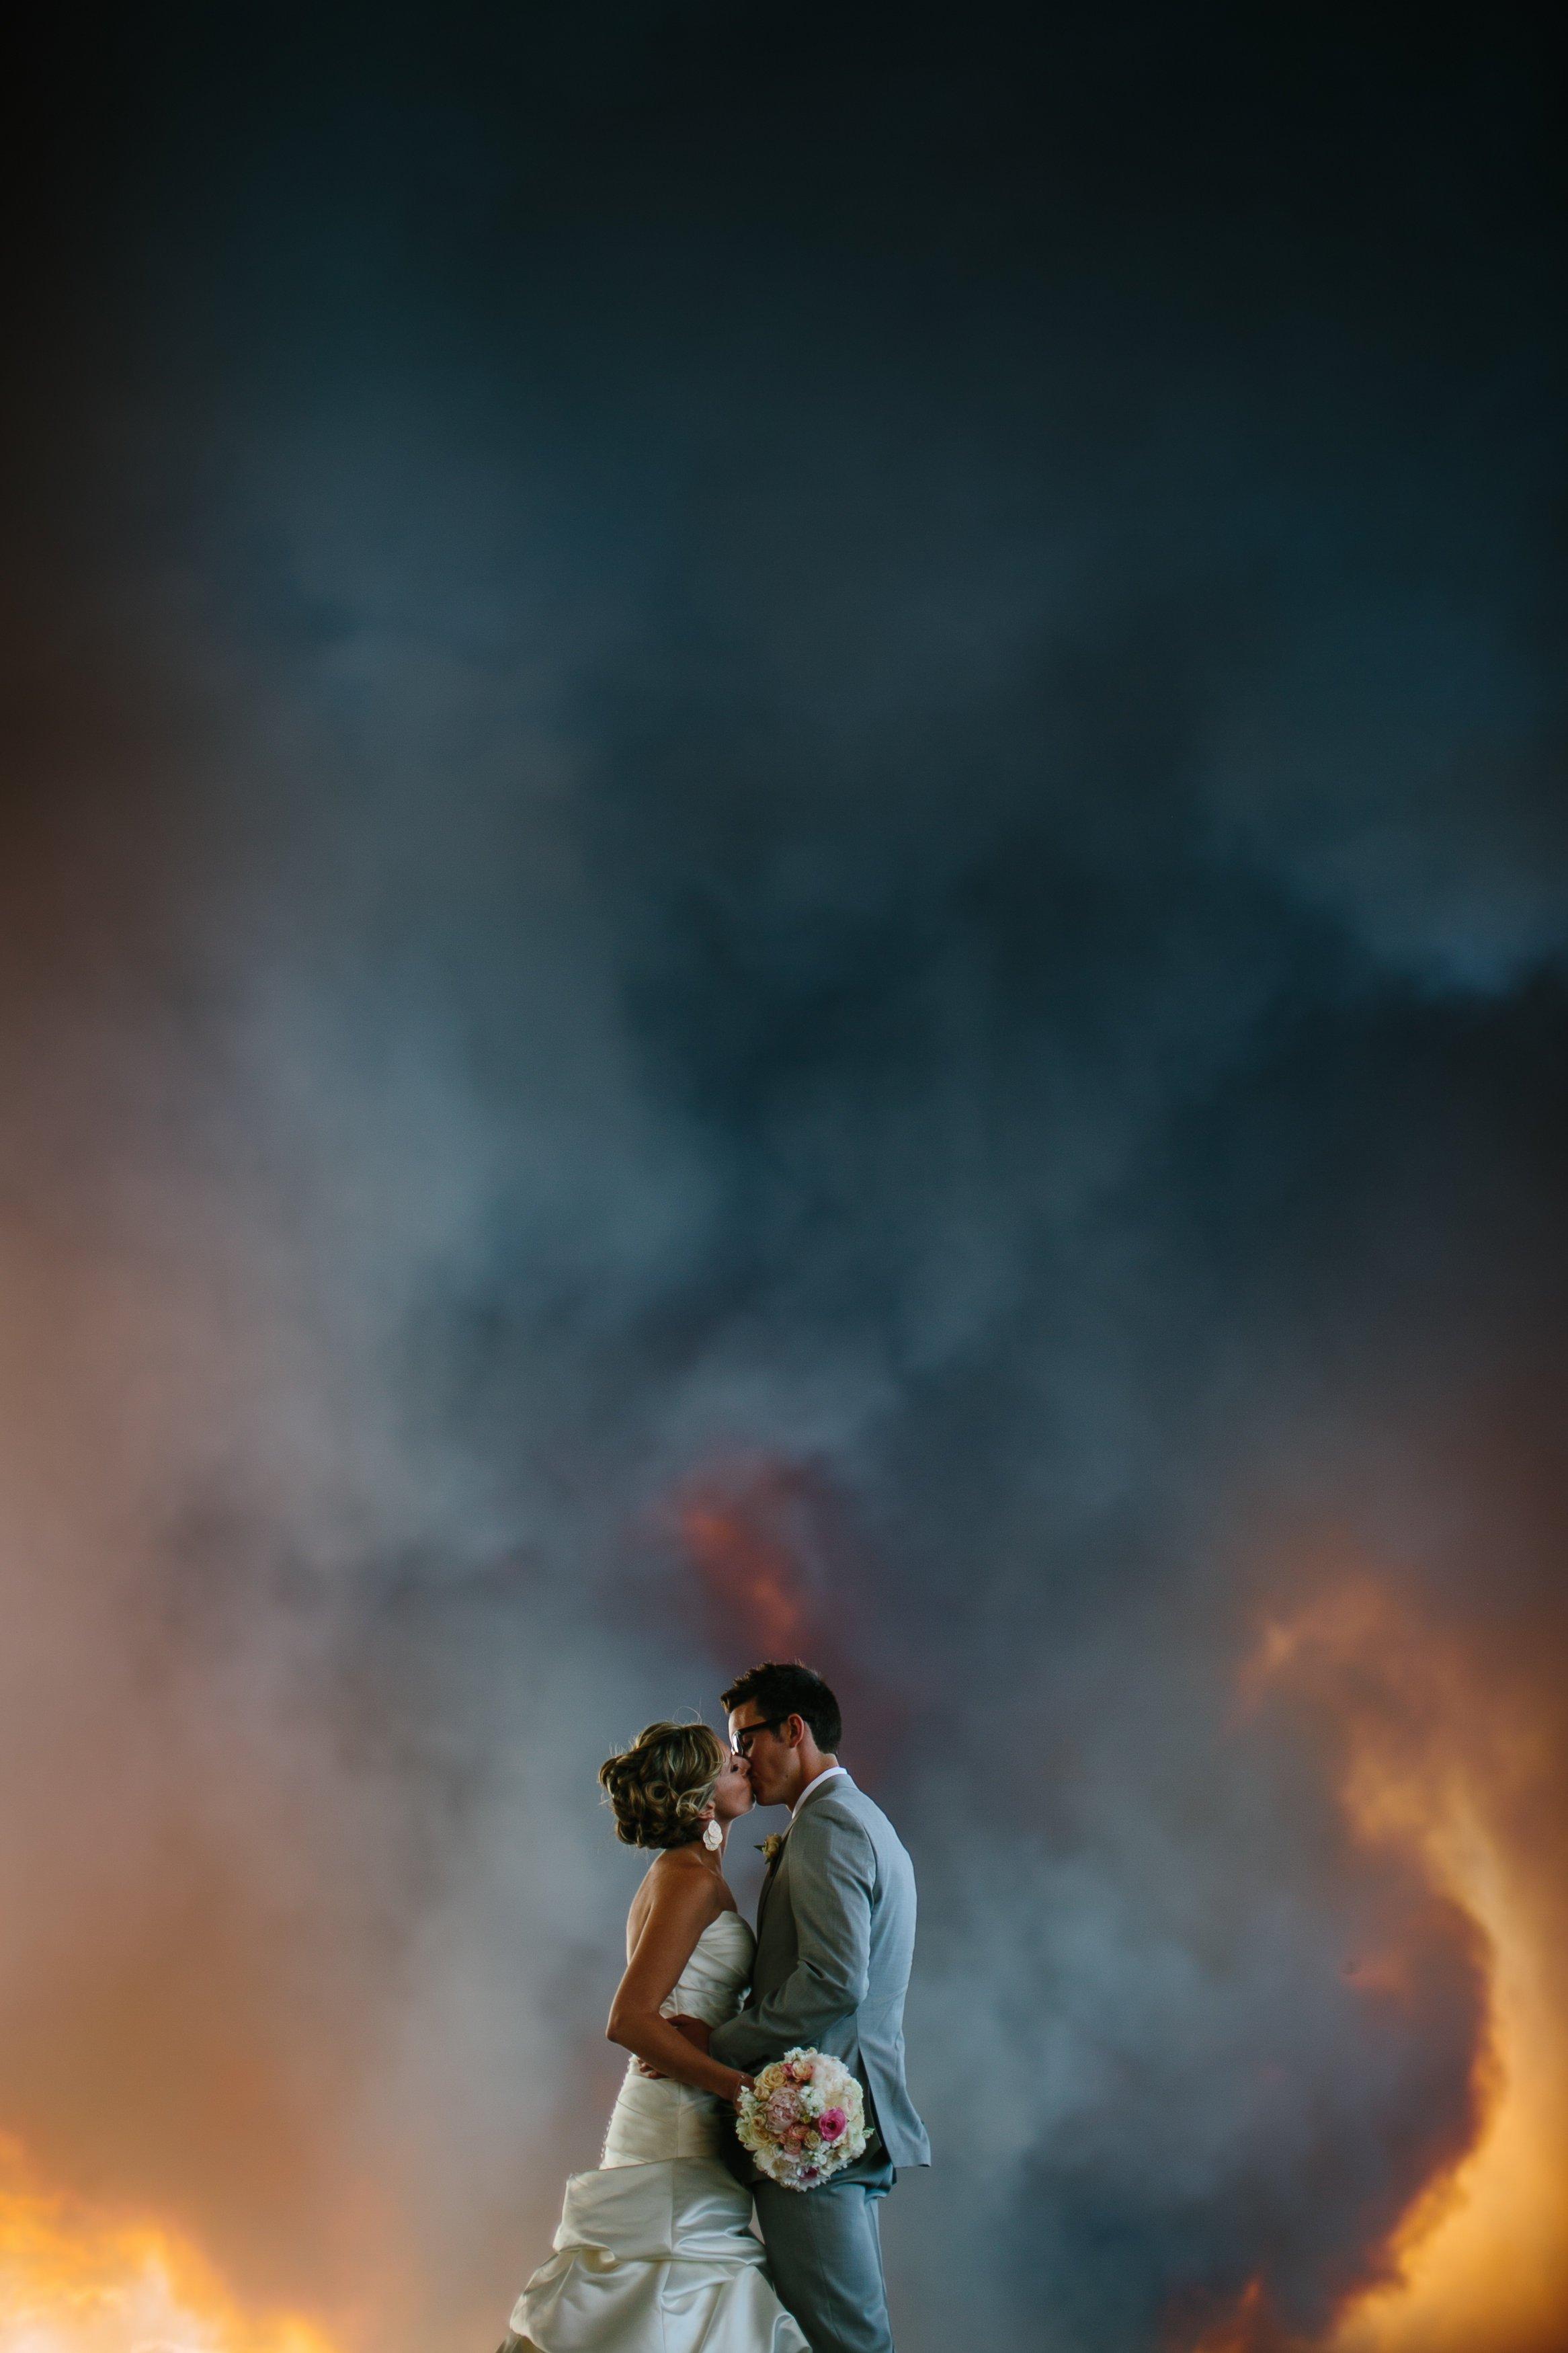 35 Ideas creativas para fotografías de bodas hermosas